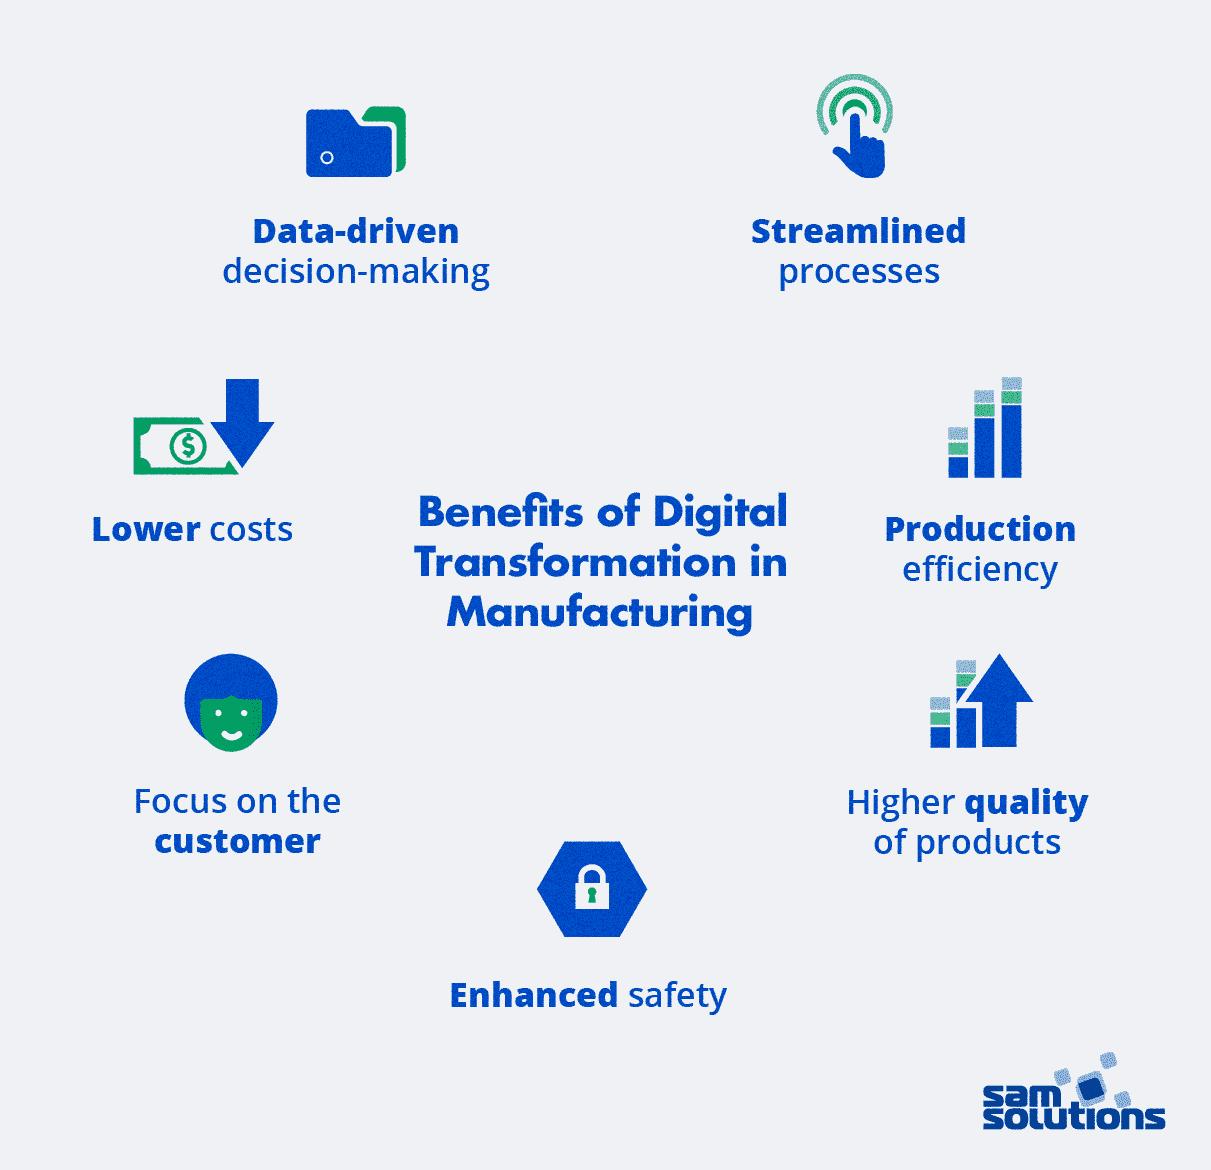 Benefits-digital transformation-in-manufacturing-photo